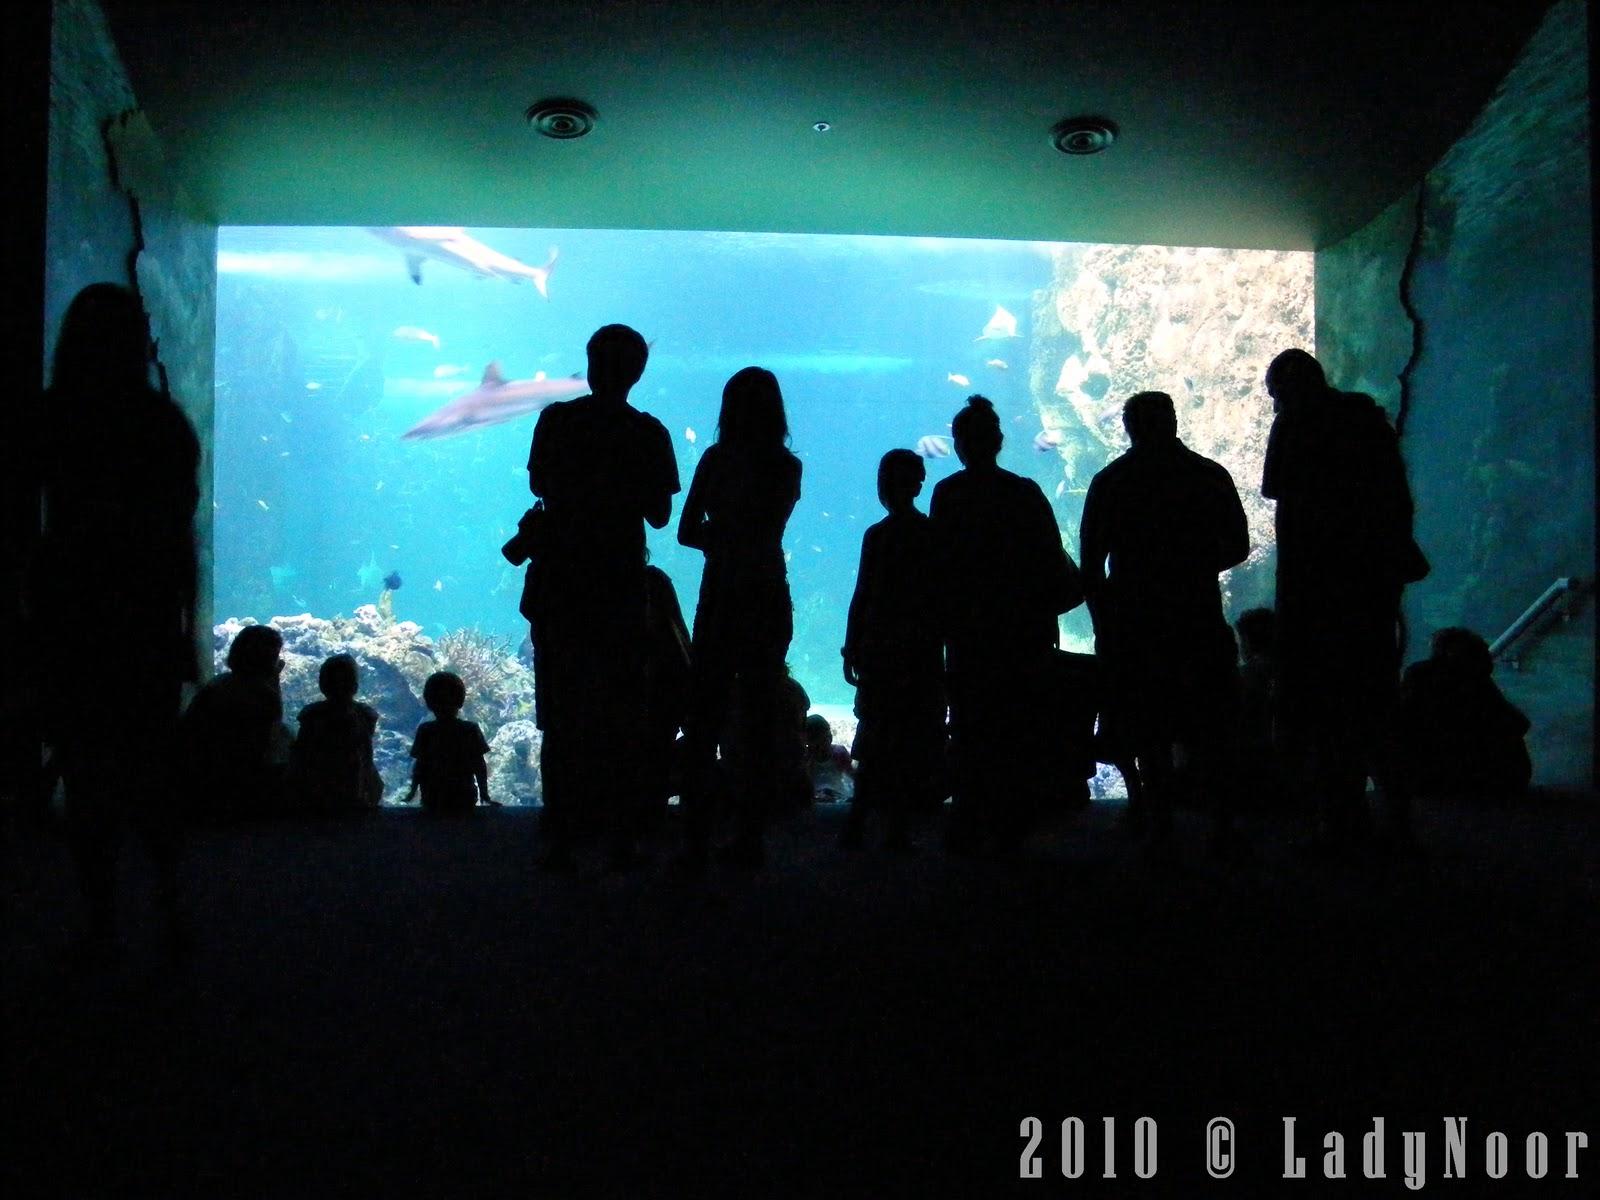 http://1.bp.blogspot.com/_8JDEdswG5Yo/TOYtJzNJVxI/AAAAAAAAEb8/Z6-5tooVtiE/s1600/aquarium.jpg